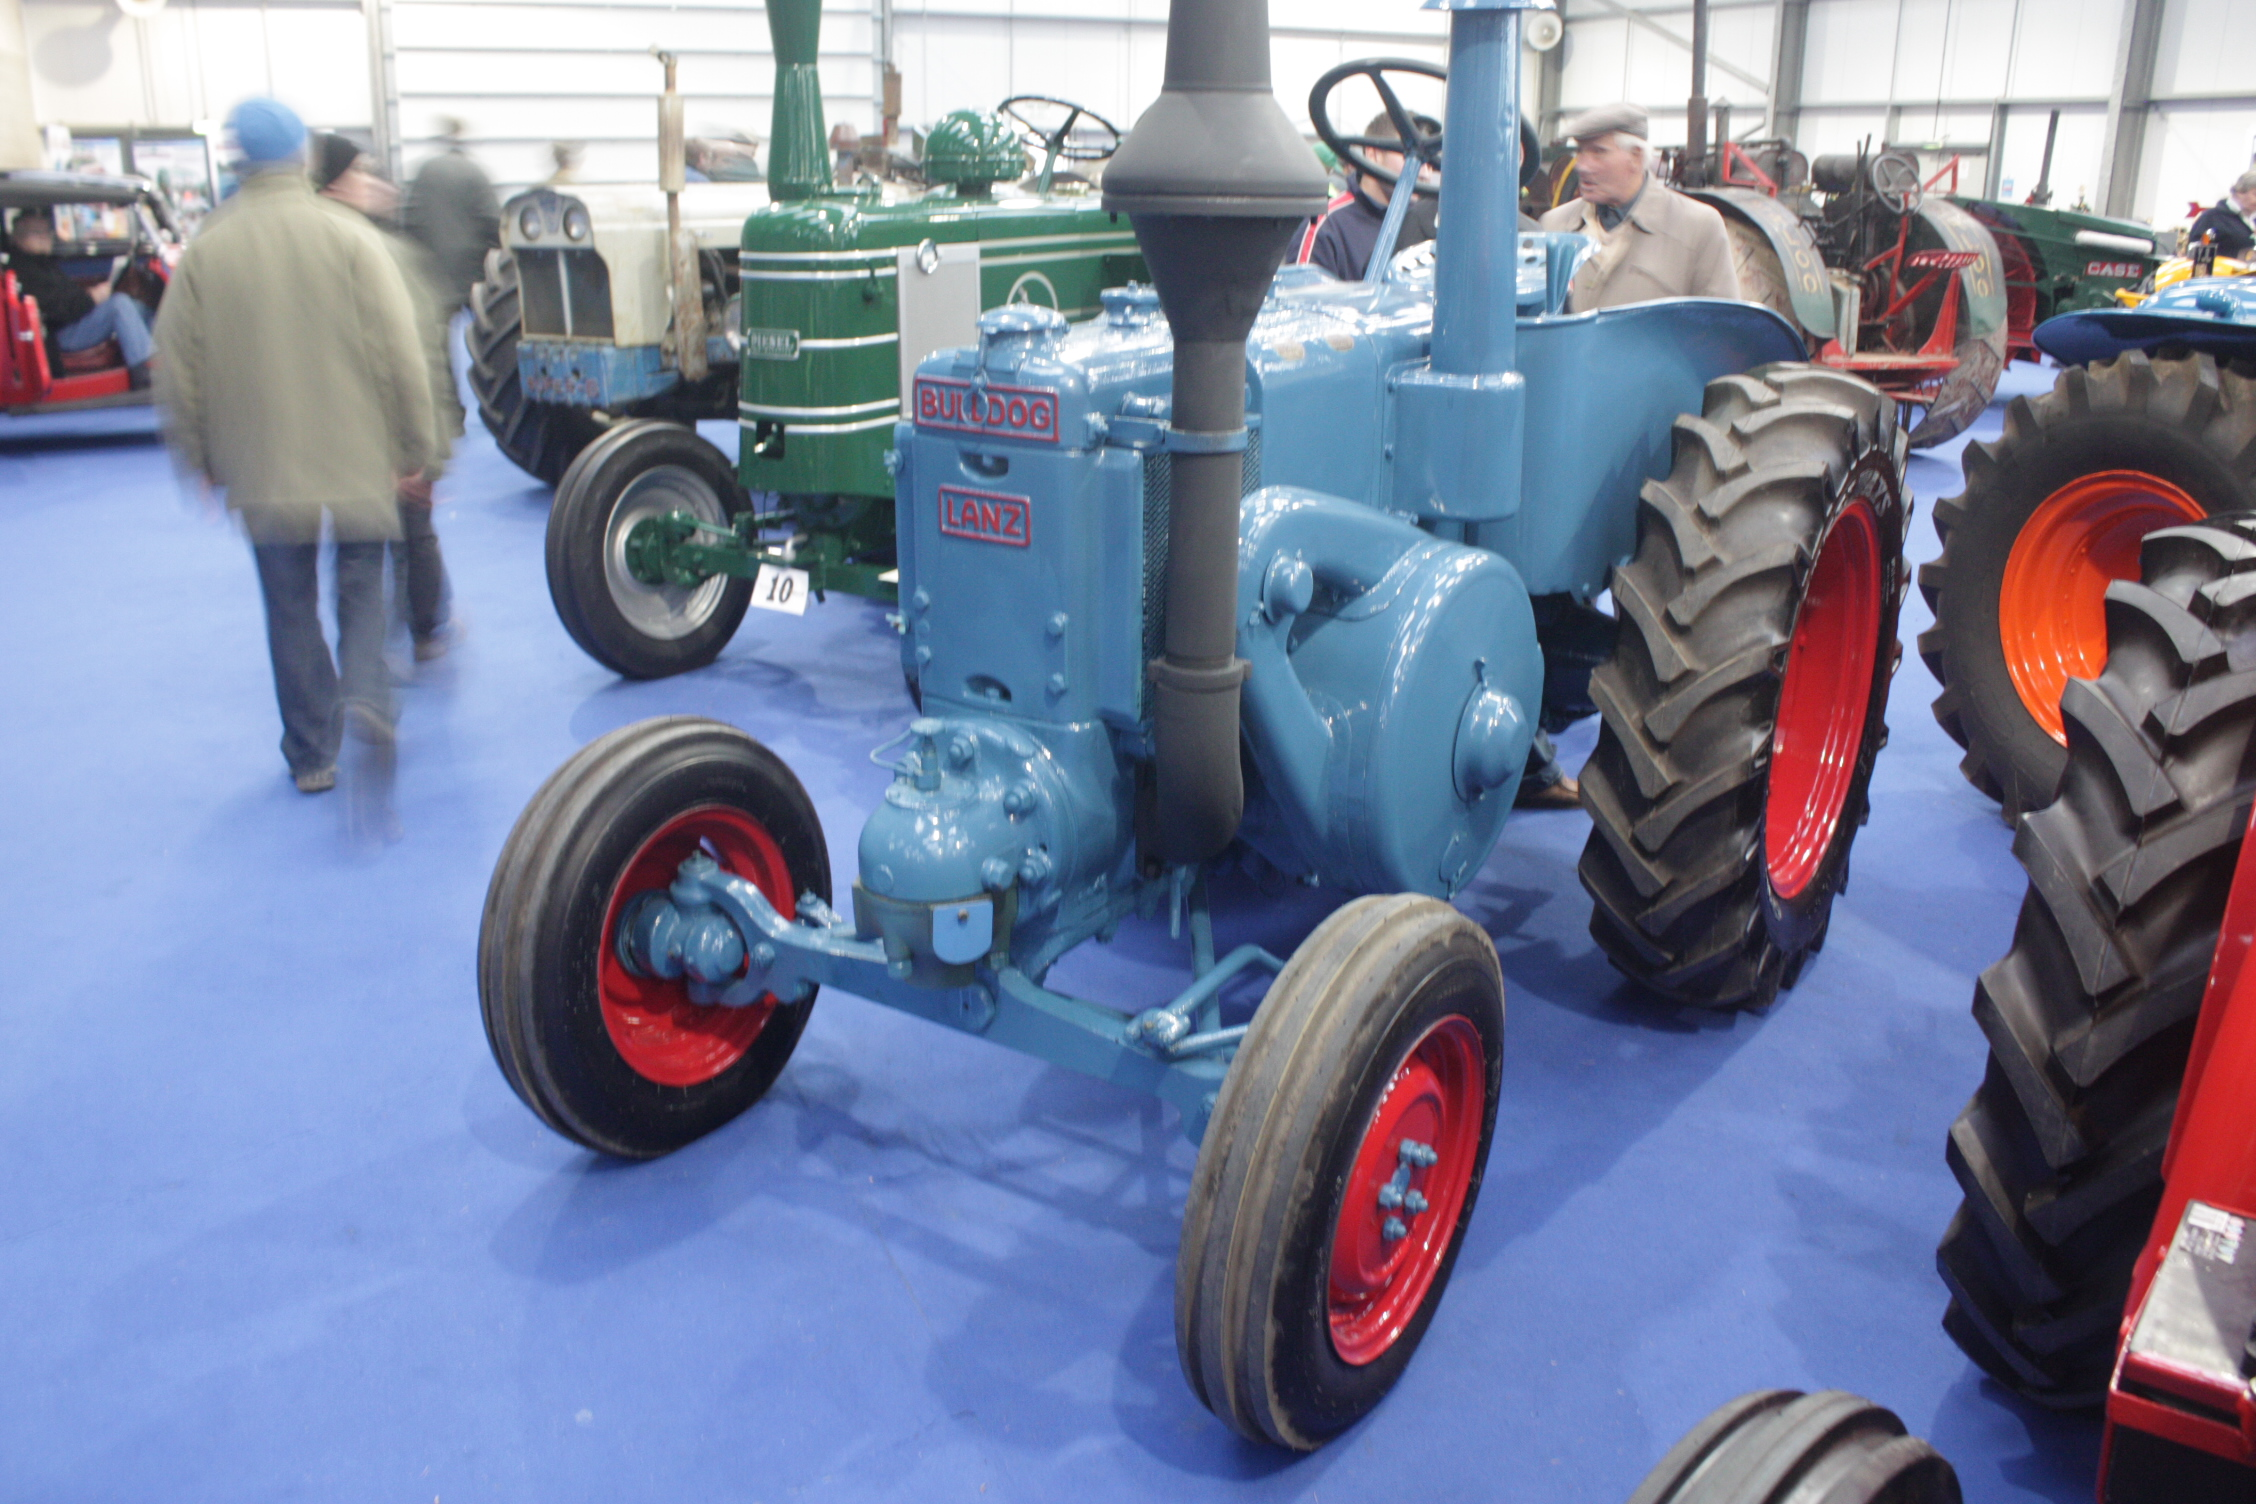 lanz bulldog tractor   eBay - Electronics, Cars, Fashion